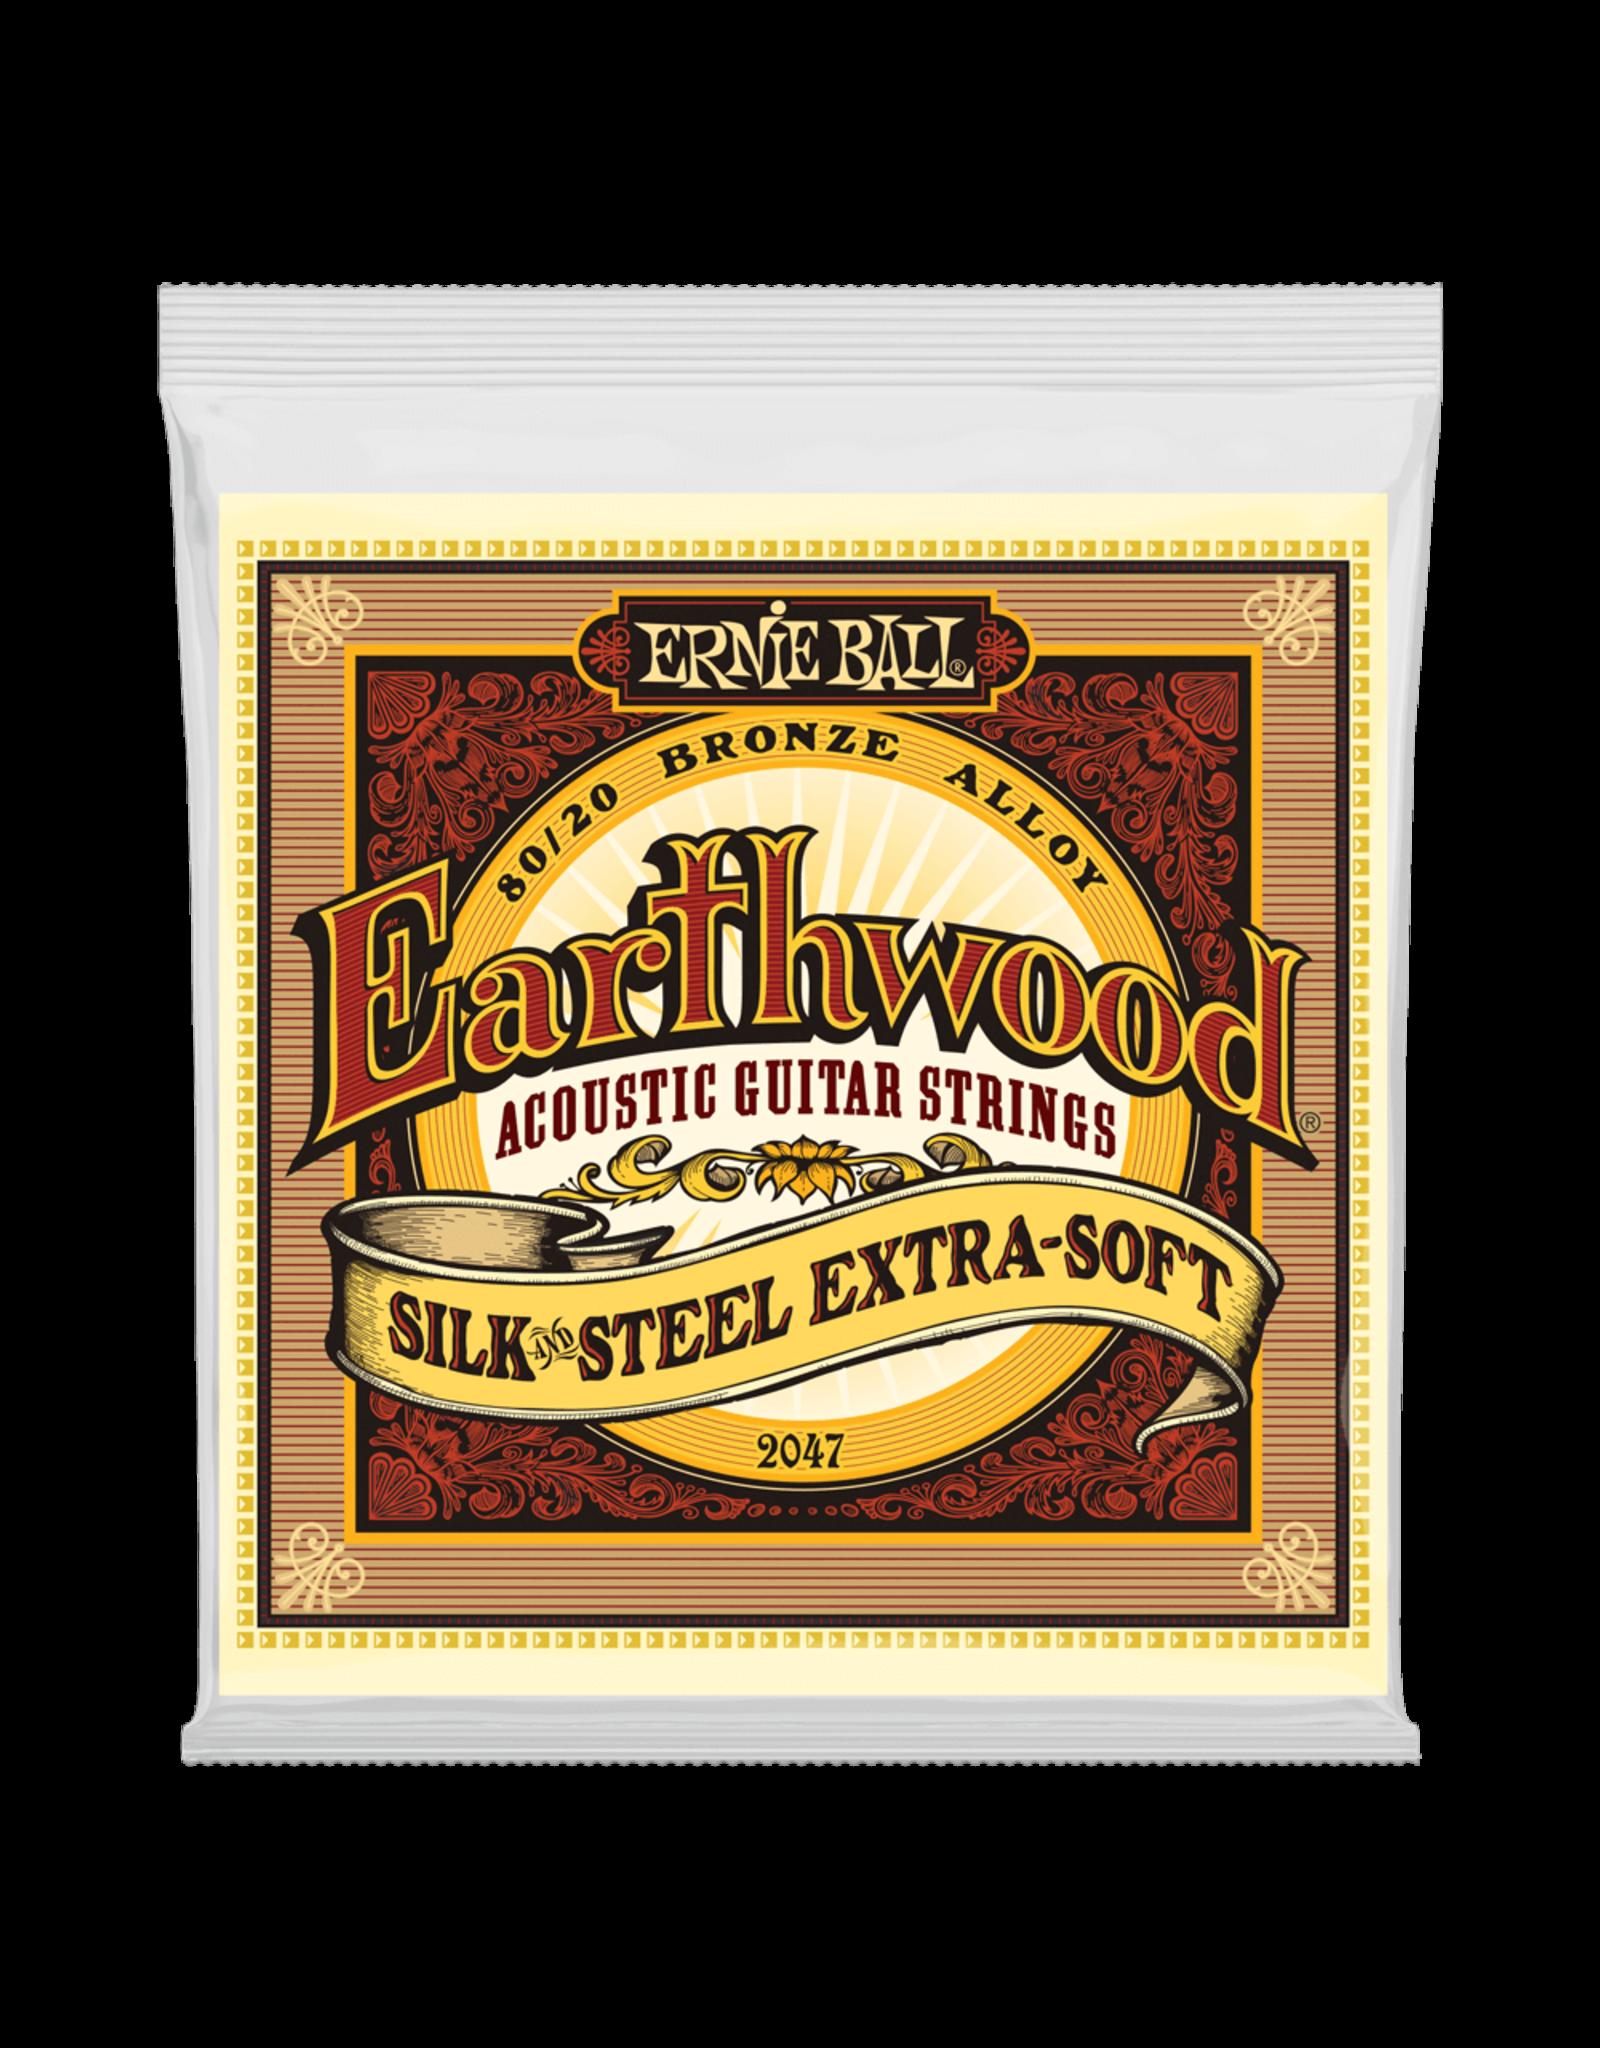 Ernie Ball Ernie Ball 2047 Earthwood Silk & Steel Extra Soft 80/20 Bronze Acoustic Guitar Strings - 10-50 Gauge